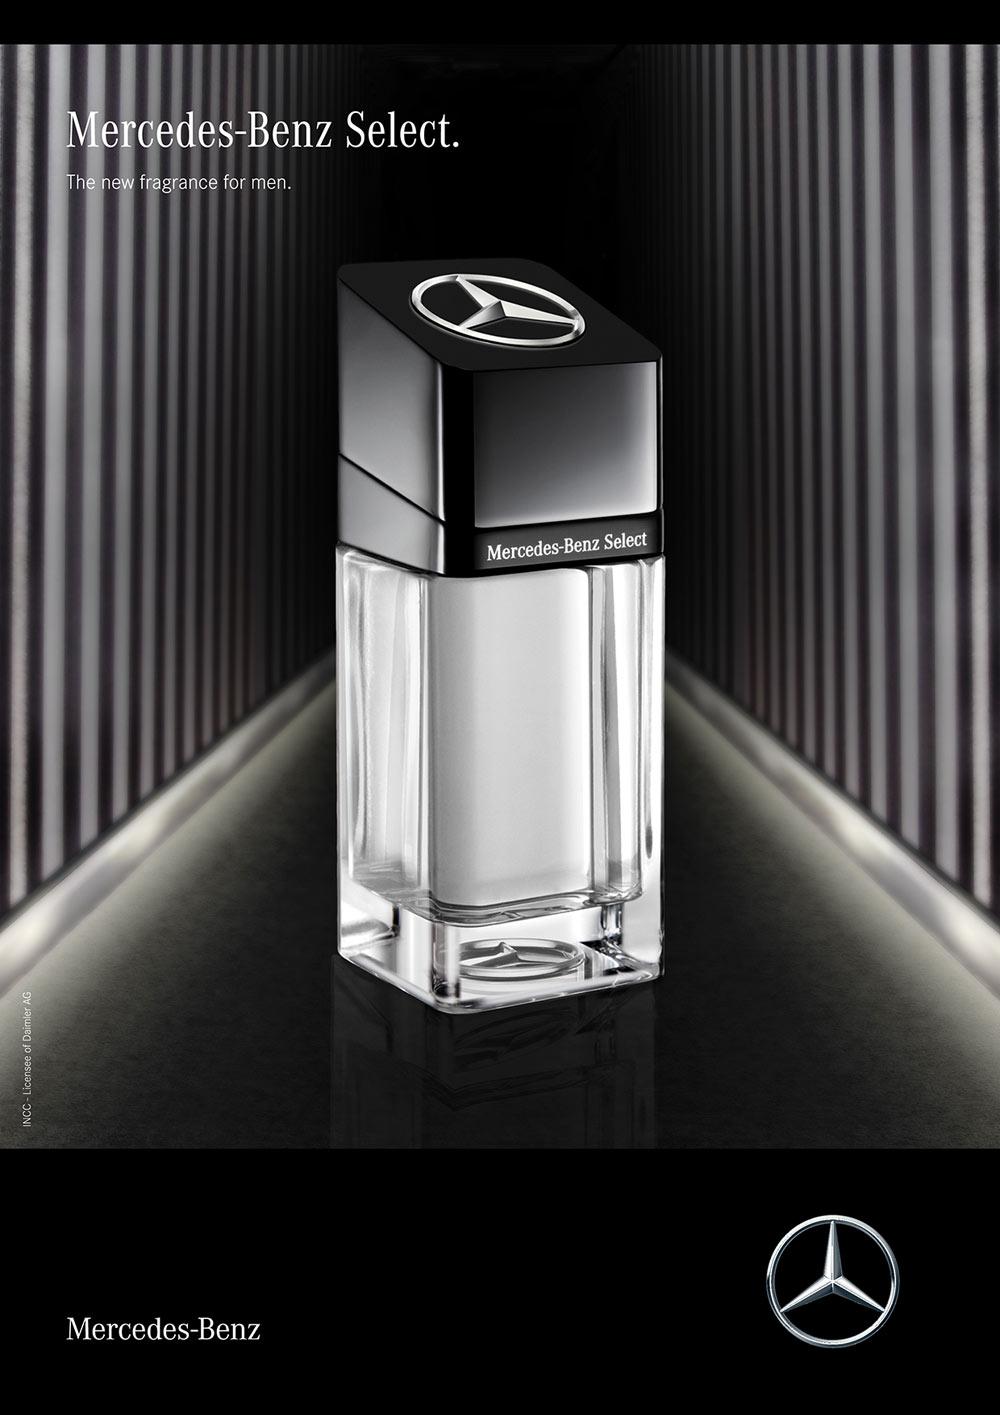 b0a24bf8f1 Mercedes-Benz Select Mercedes-Benz colônia - a novo fragrância ...